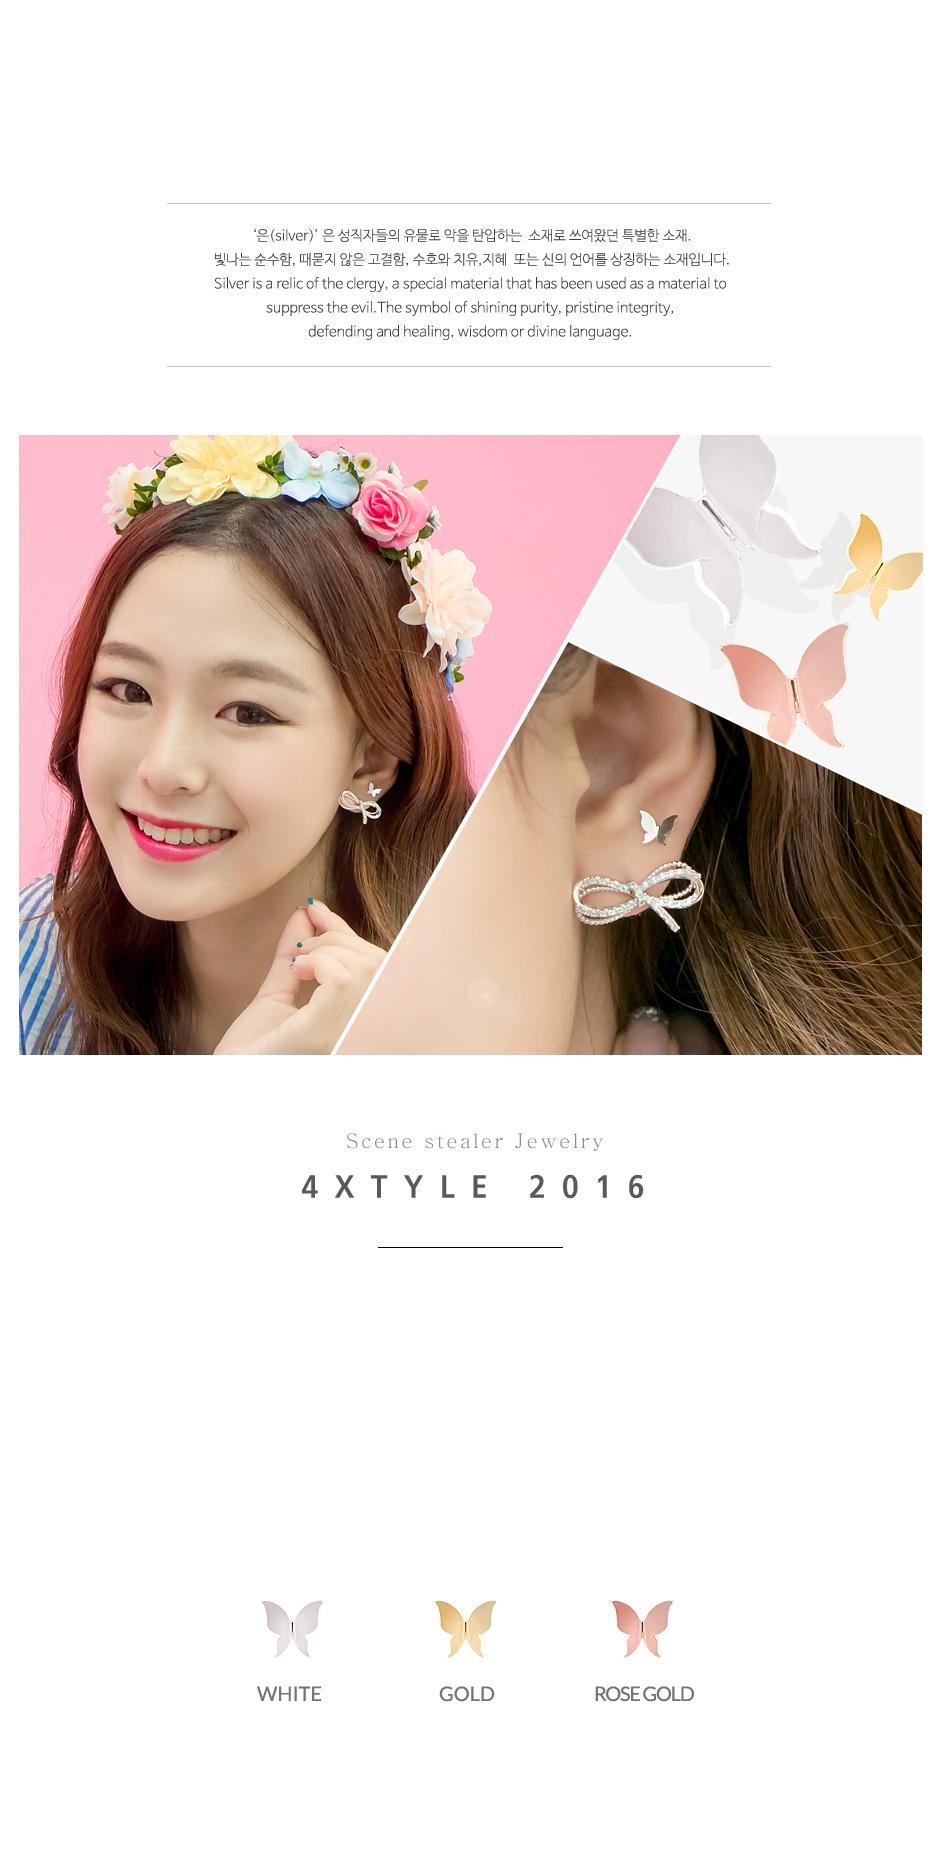 [ 4xtyle ] 迷你蝴蝶刺(白色)